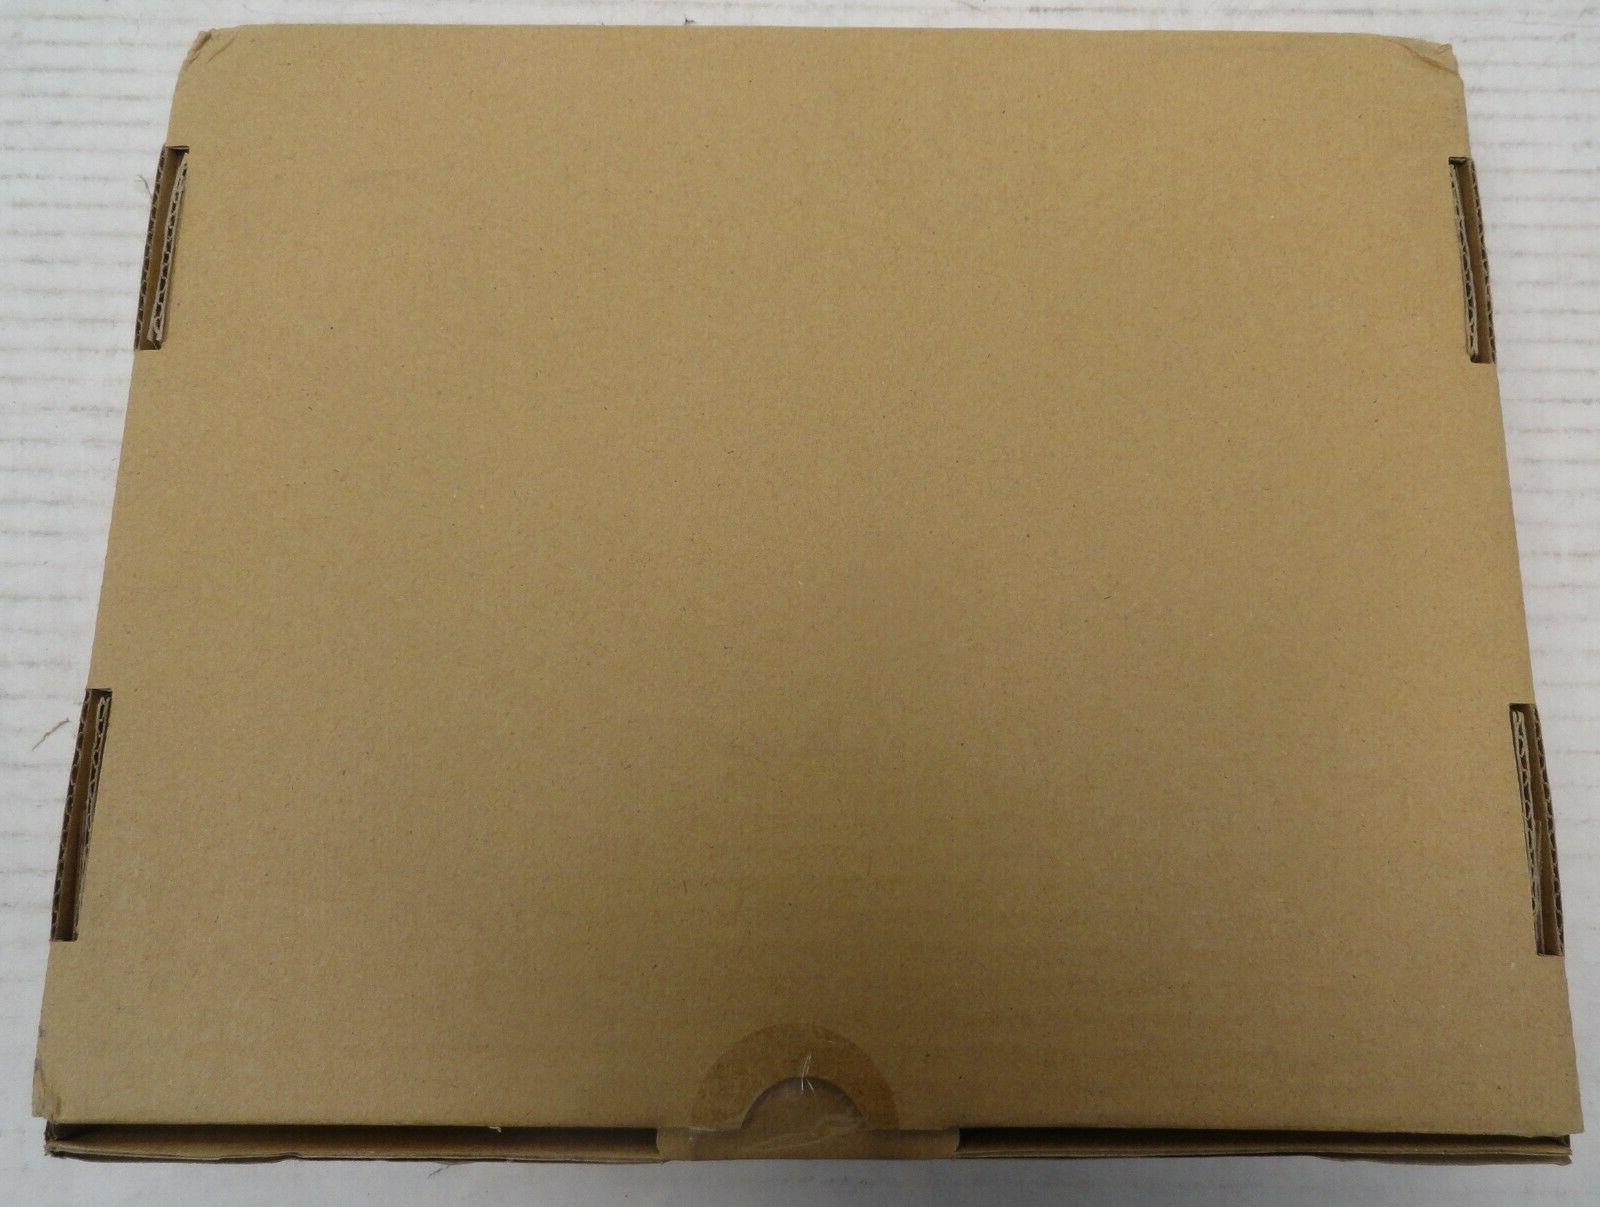 RCA FG, ANTDISH, DISH, DN010165